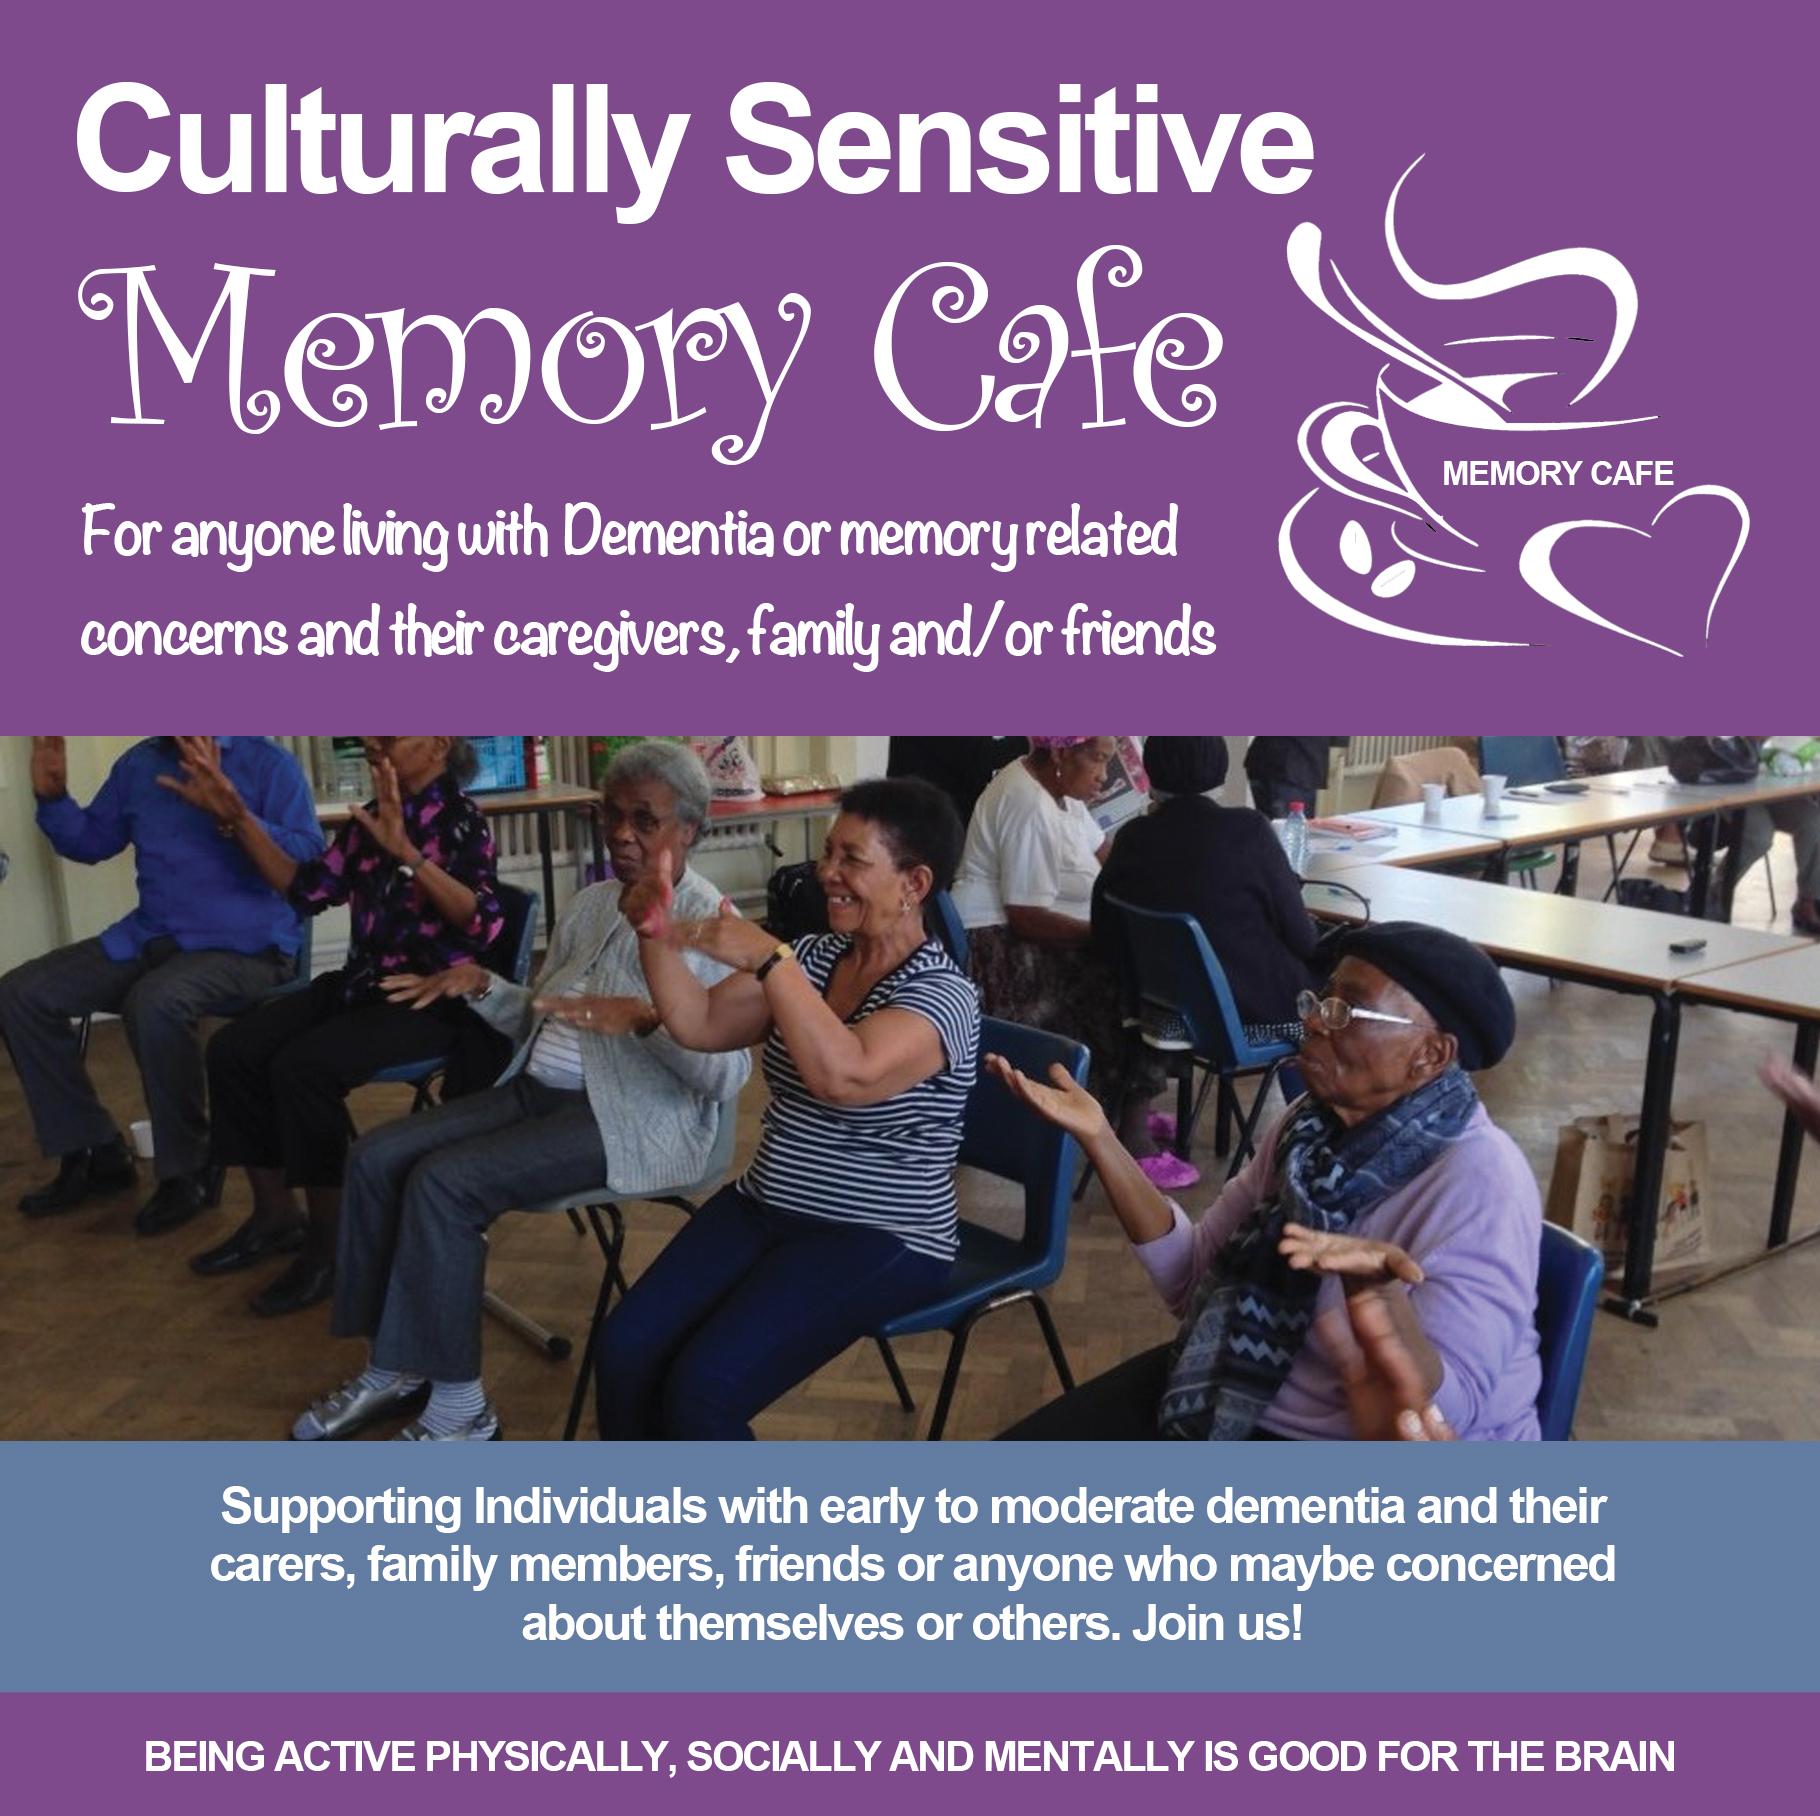 Culturally Sensitive Dementia Support Campaign